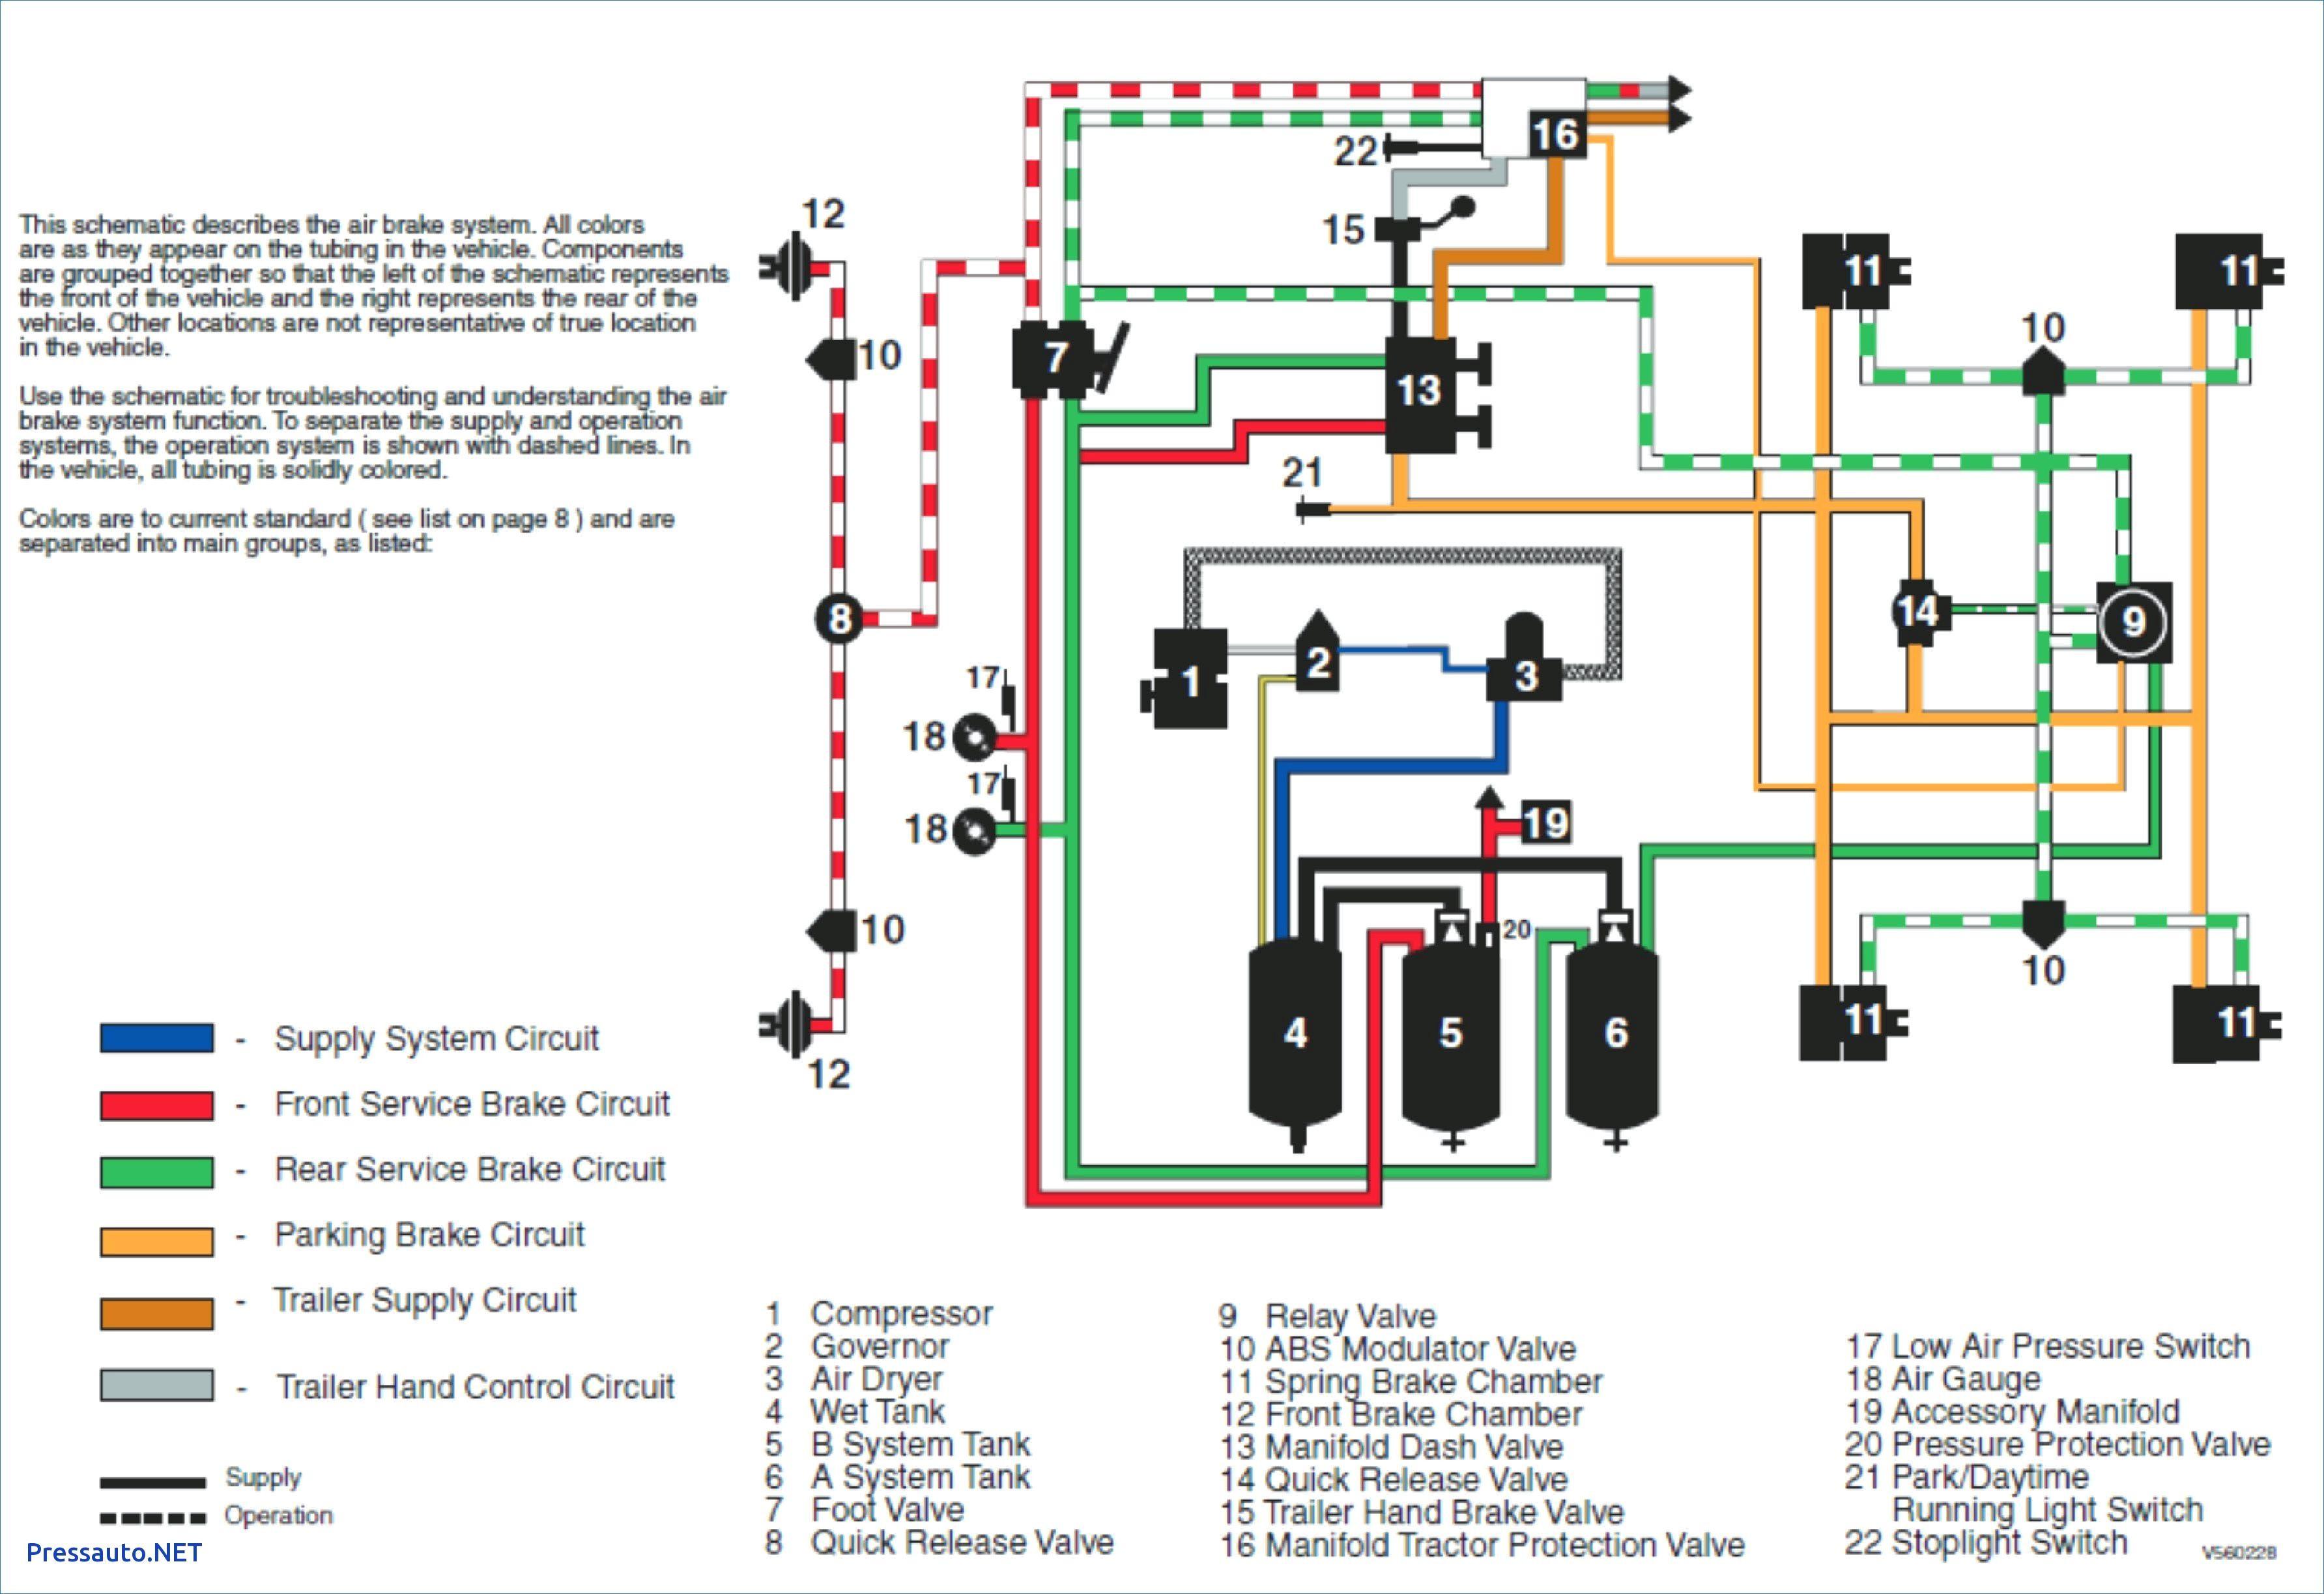 Car Trailer Wiring Diagram Nz : Beautiful car trailer plug wiring diagram image collection